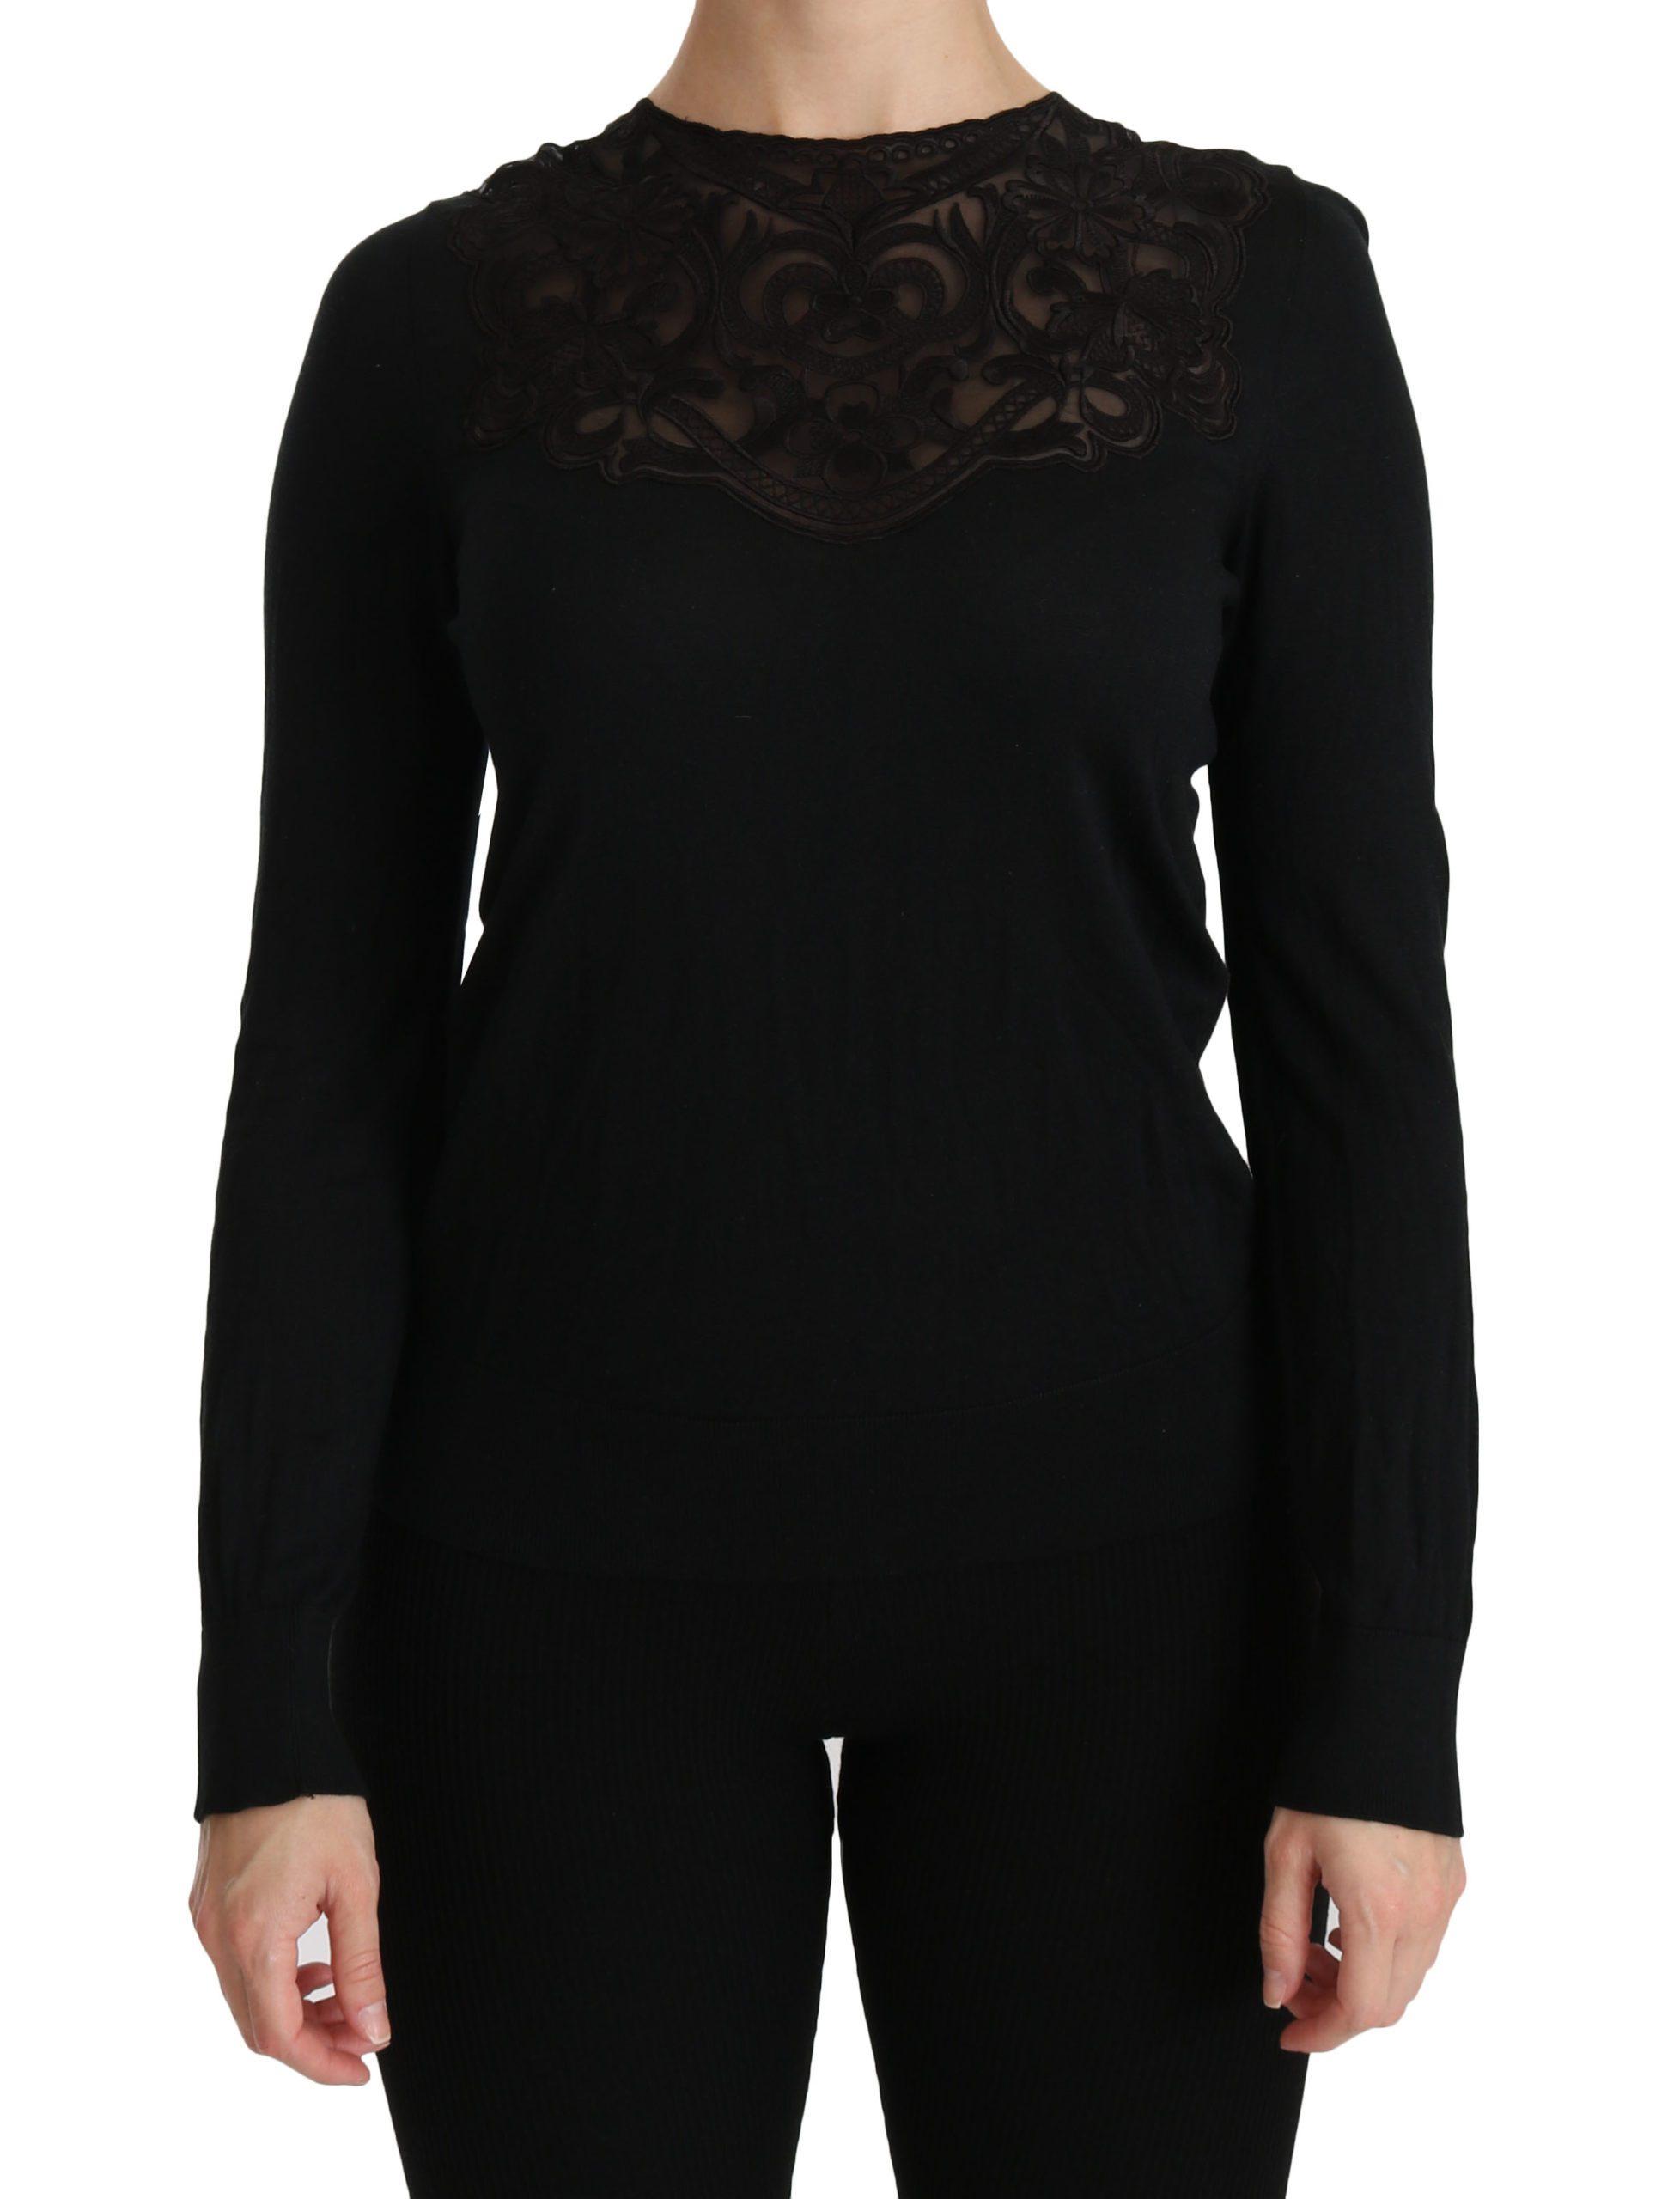 Black Silk Lace Crew Neck Long Sleeve Blouse - IT40|S